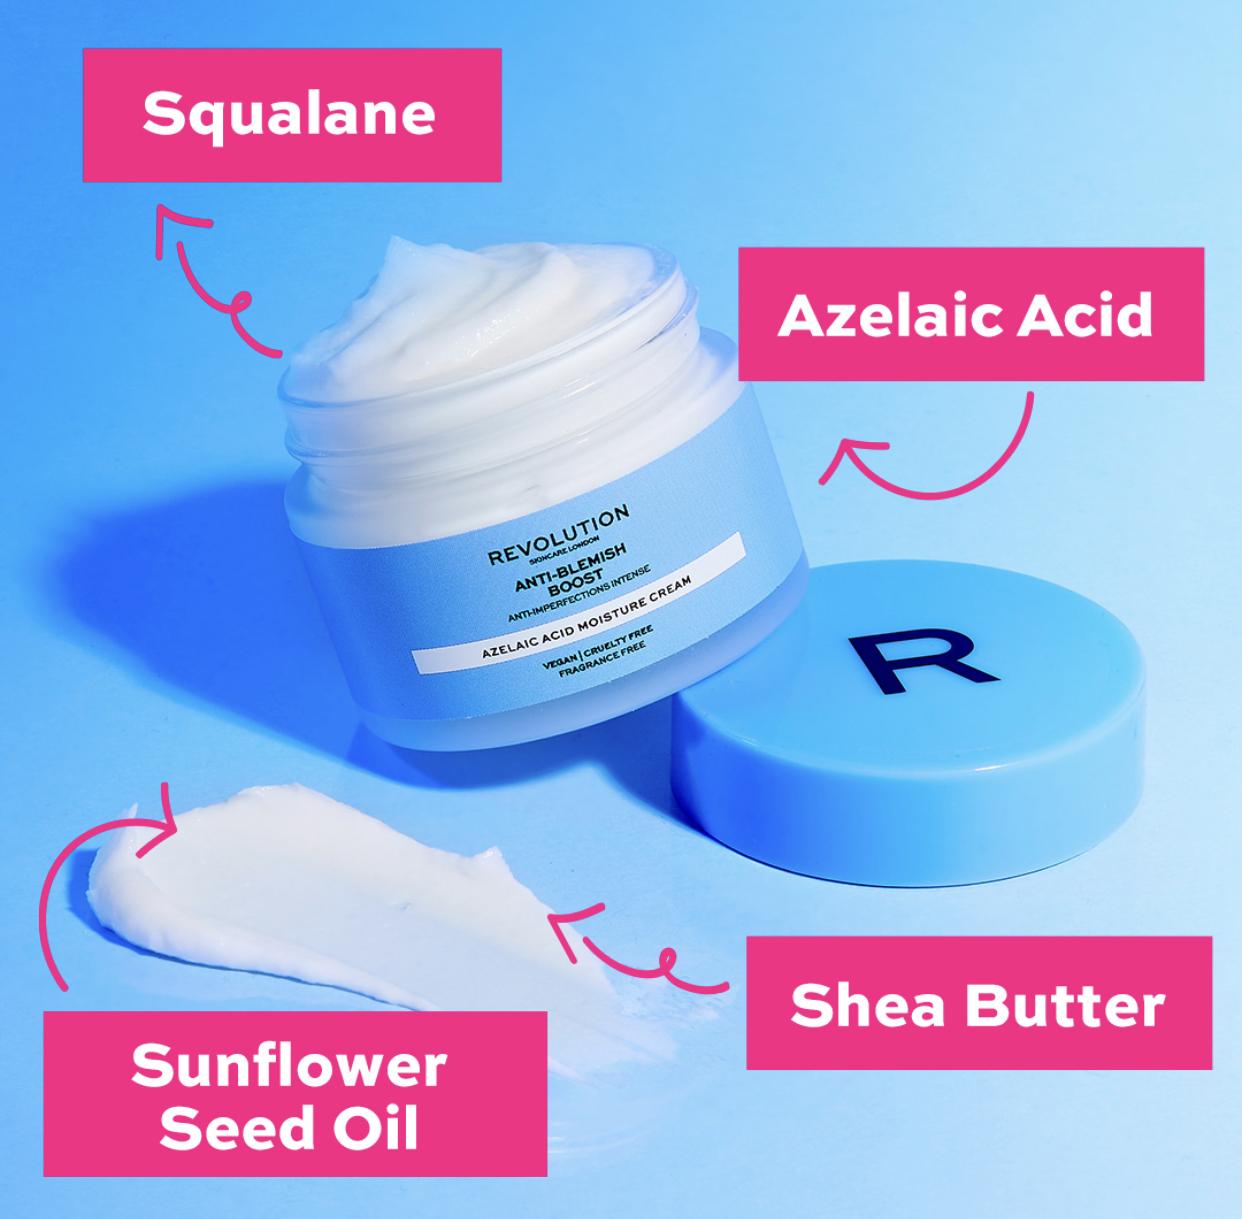 Revolution Skincare Anti Blemish Boost Azelaic Acid Moisture Cream 1